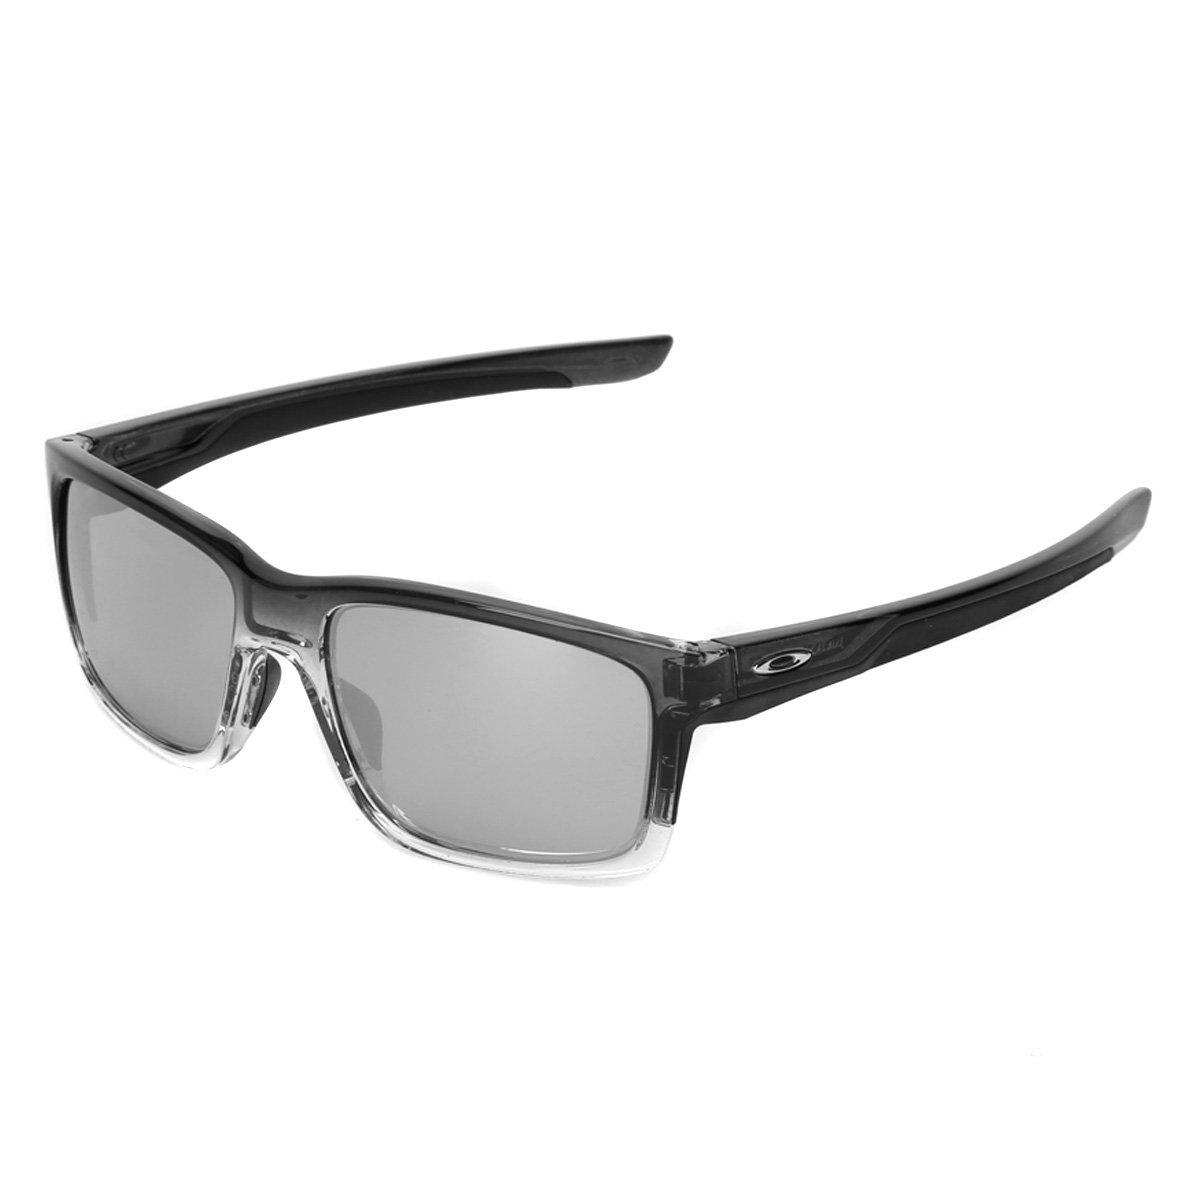 21e91f3bf0f84 Óculos de Sol Oakley Mainlink Masculino